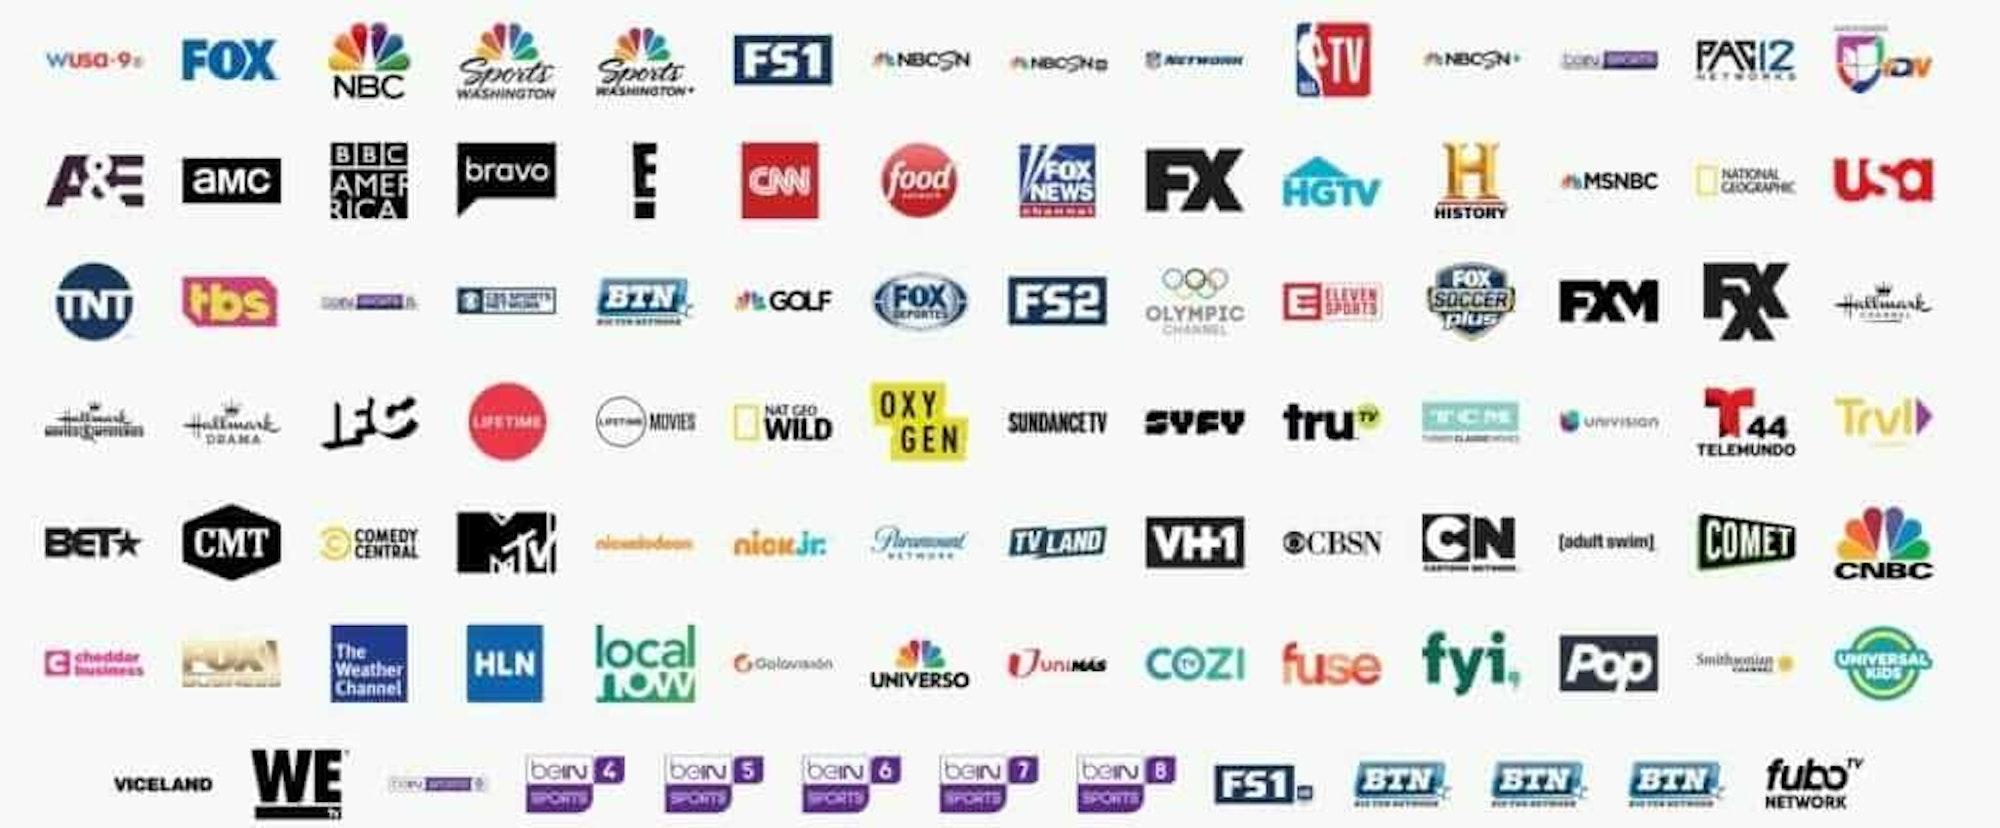 steelers ravens fubo tv streaming nfl afc